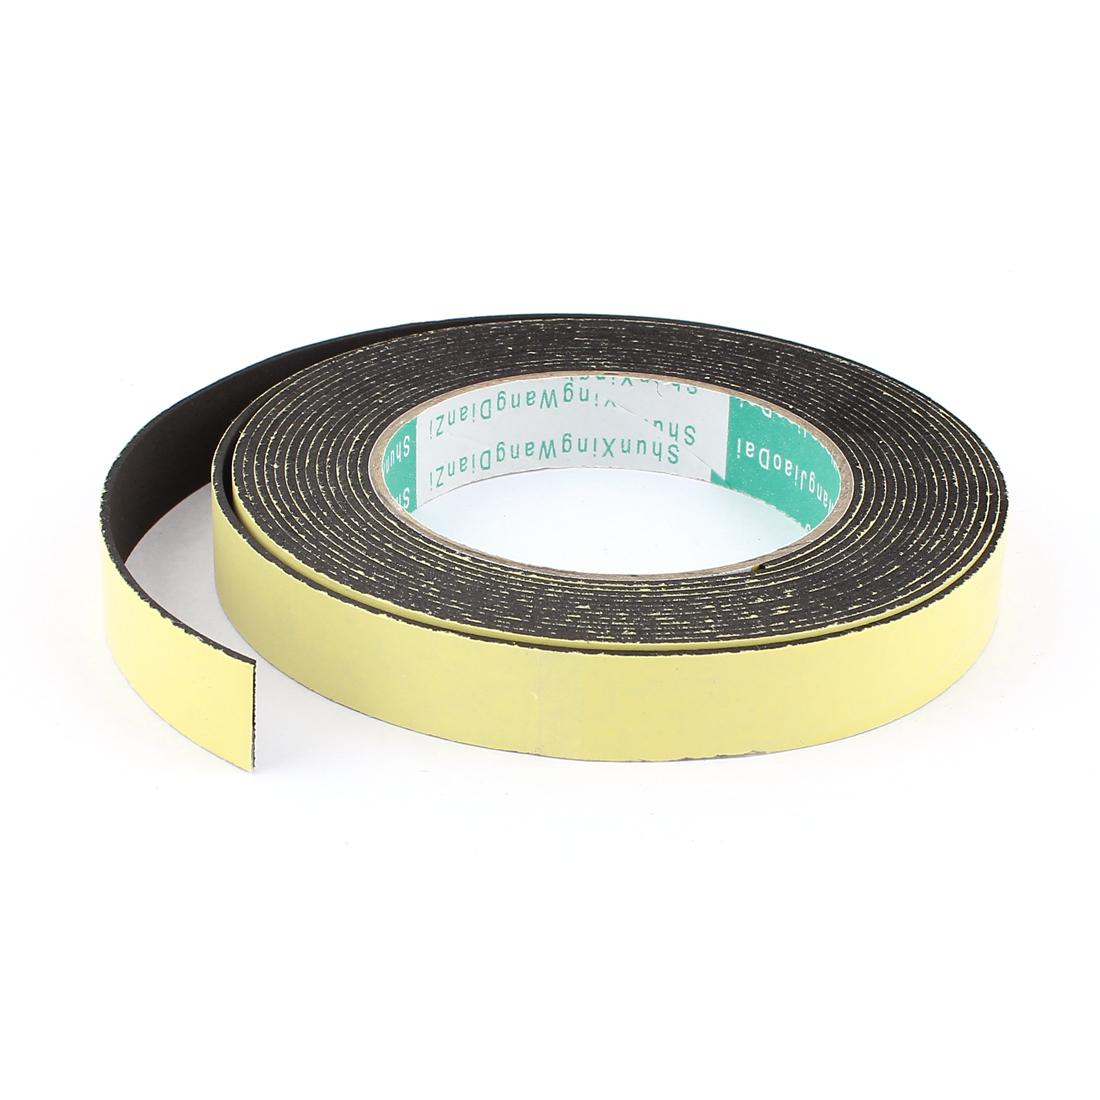 5M 18mm x 1.5mm Single Side Adhesive Foam Sealing Tape for Door Window